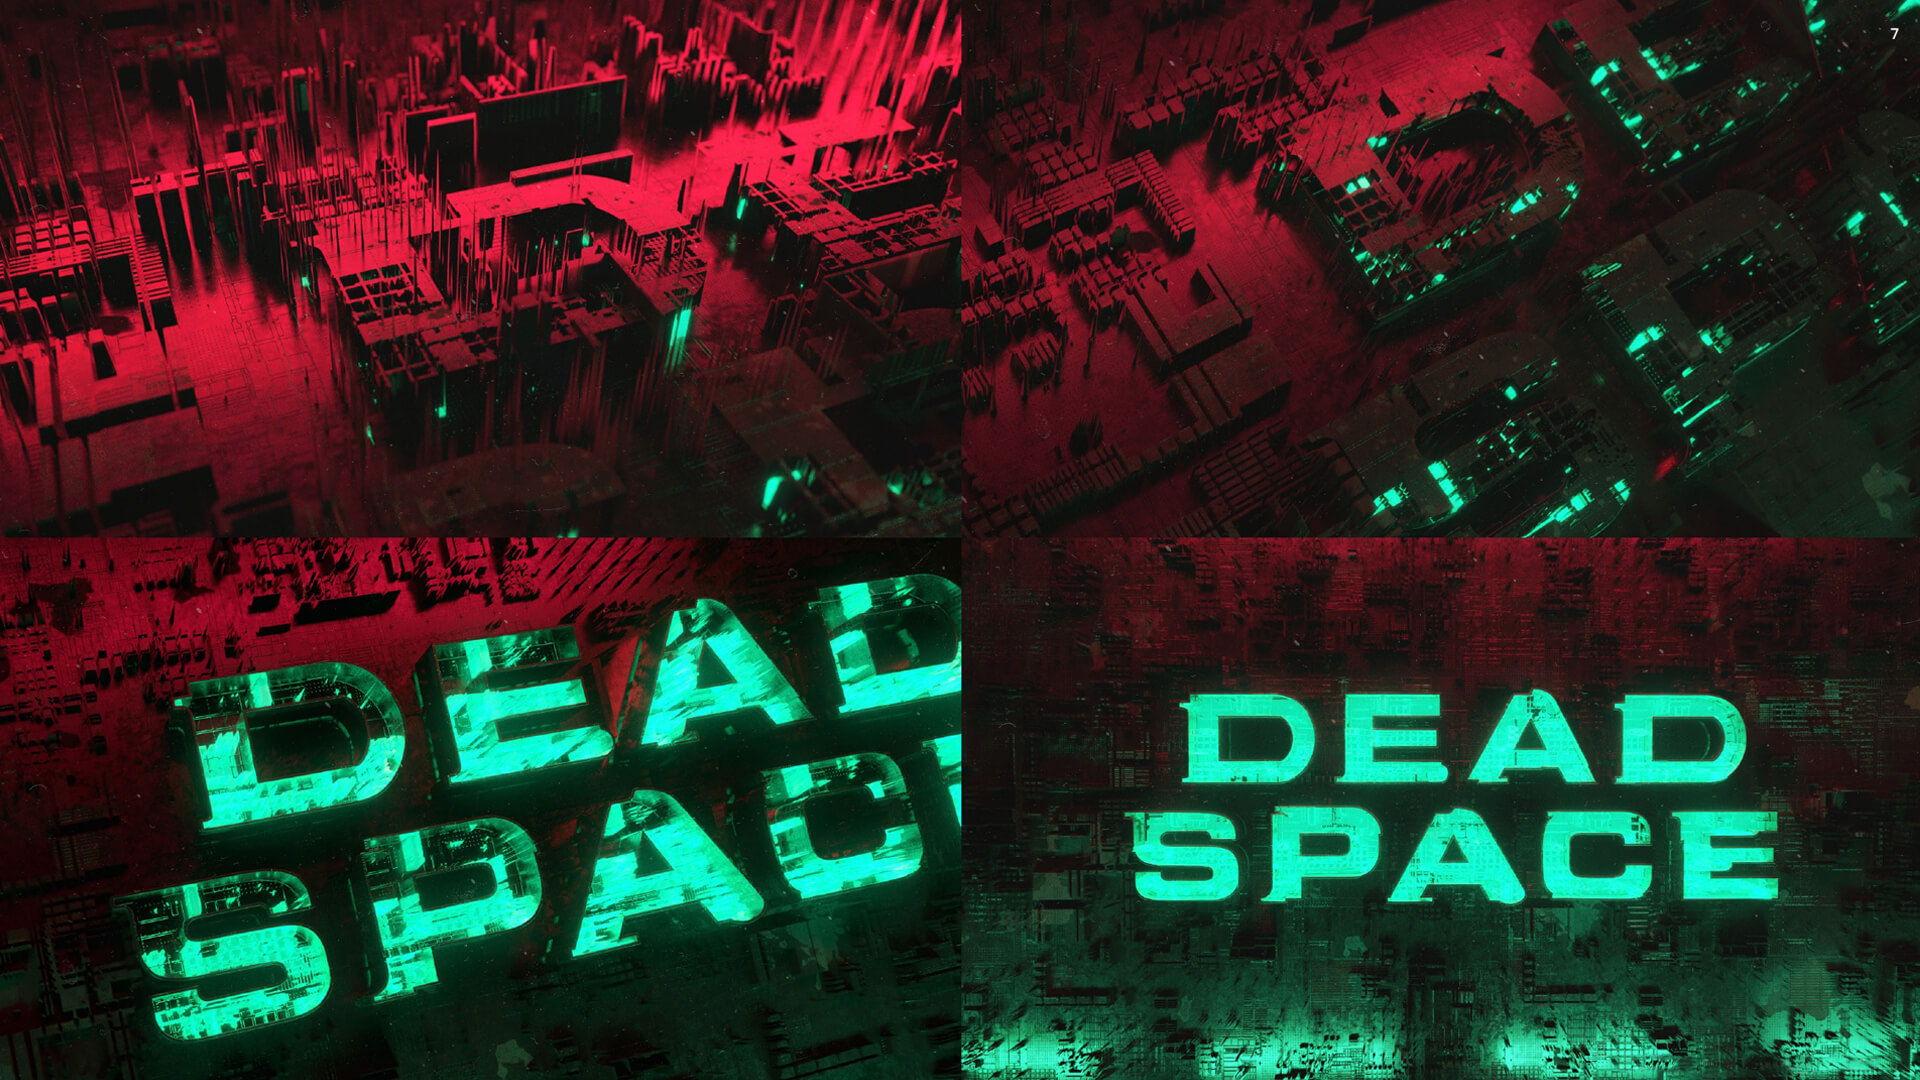 deadspaceframes_03